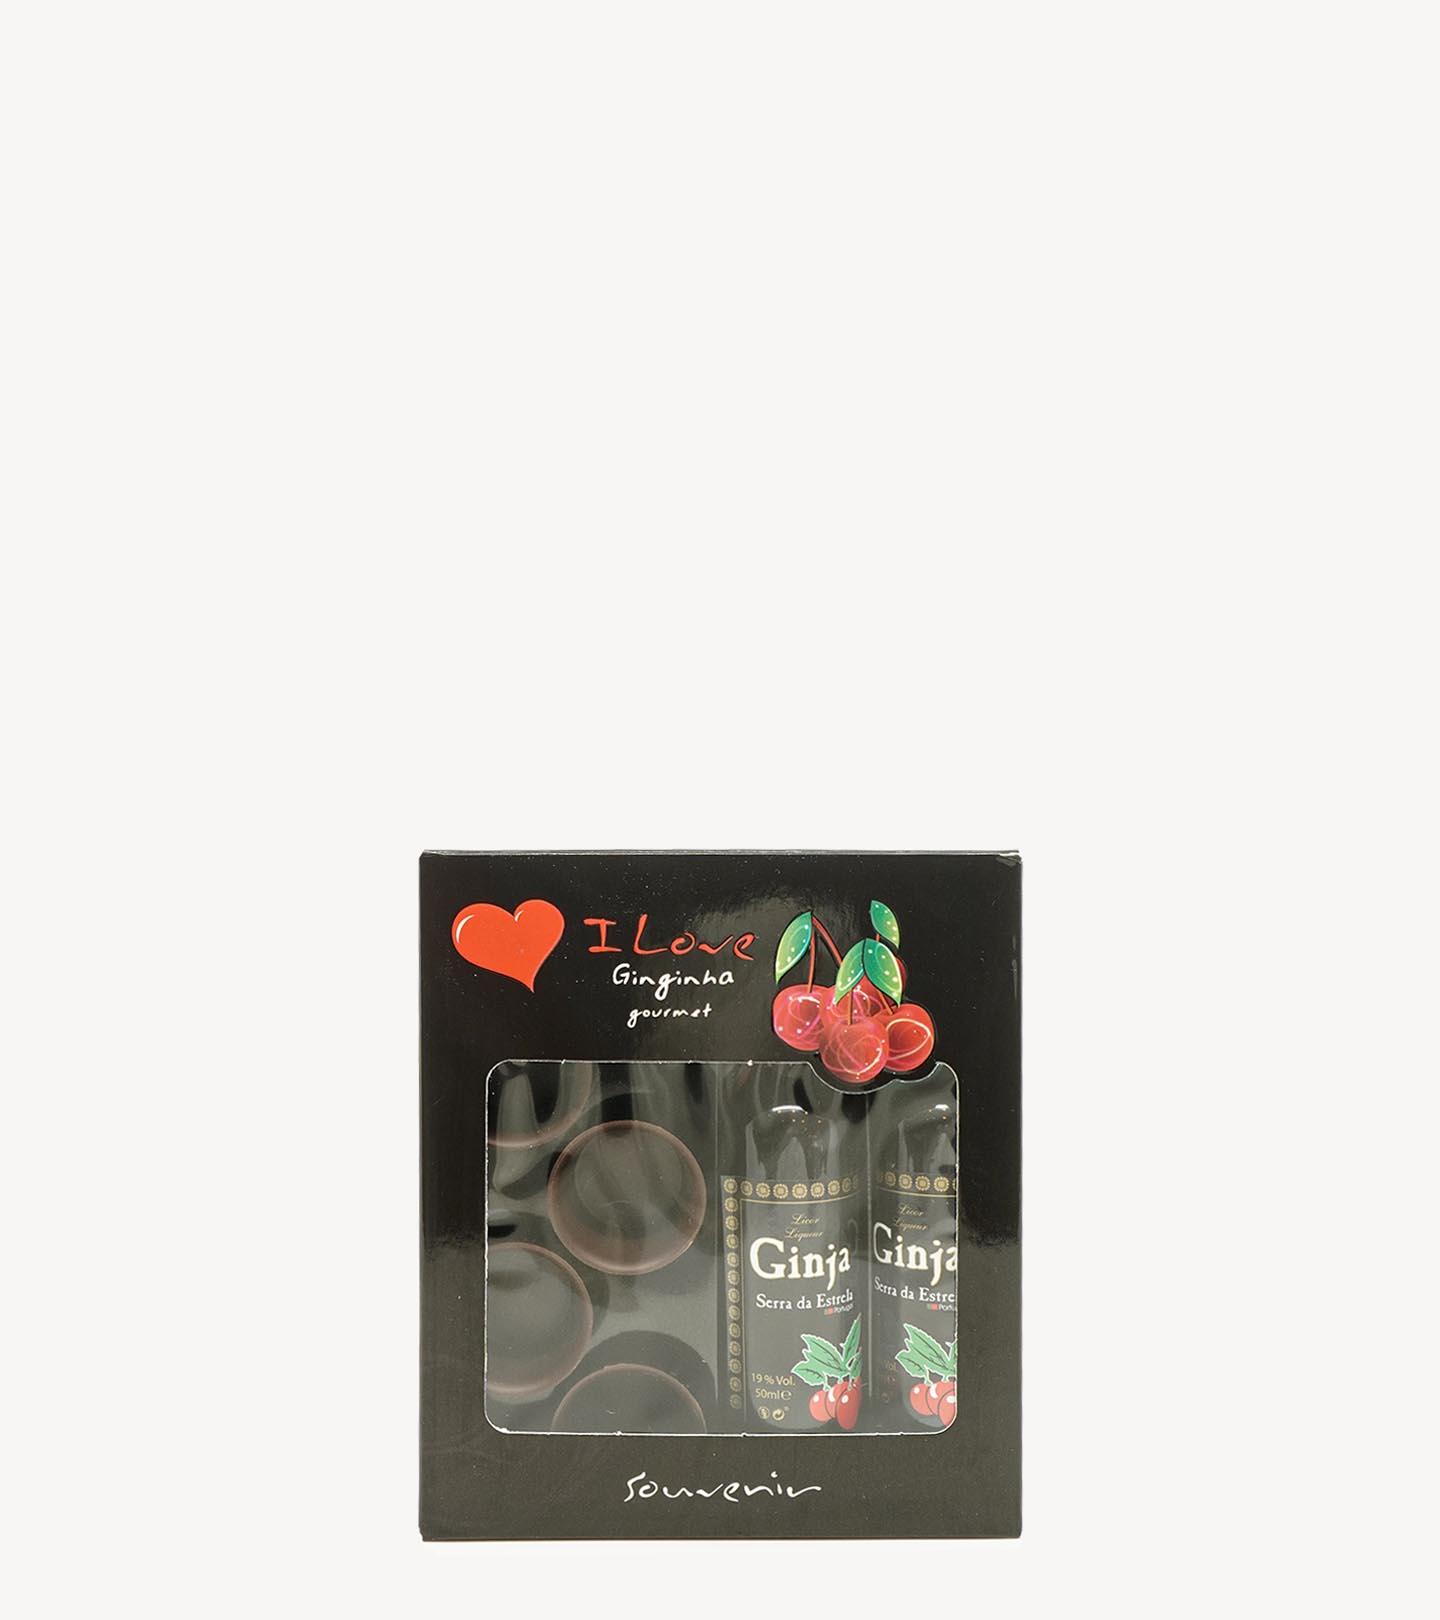 Gift c/ 2 garrafas de Licor Ginja Serra da Estrela c/ Copos de Chocolate 2x5cl